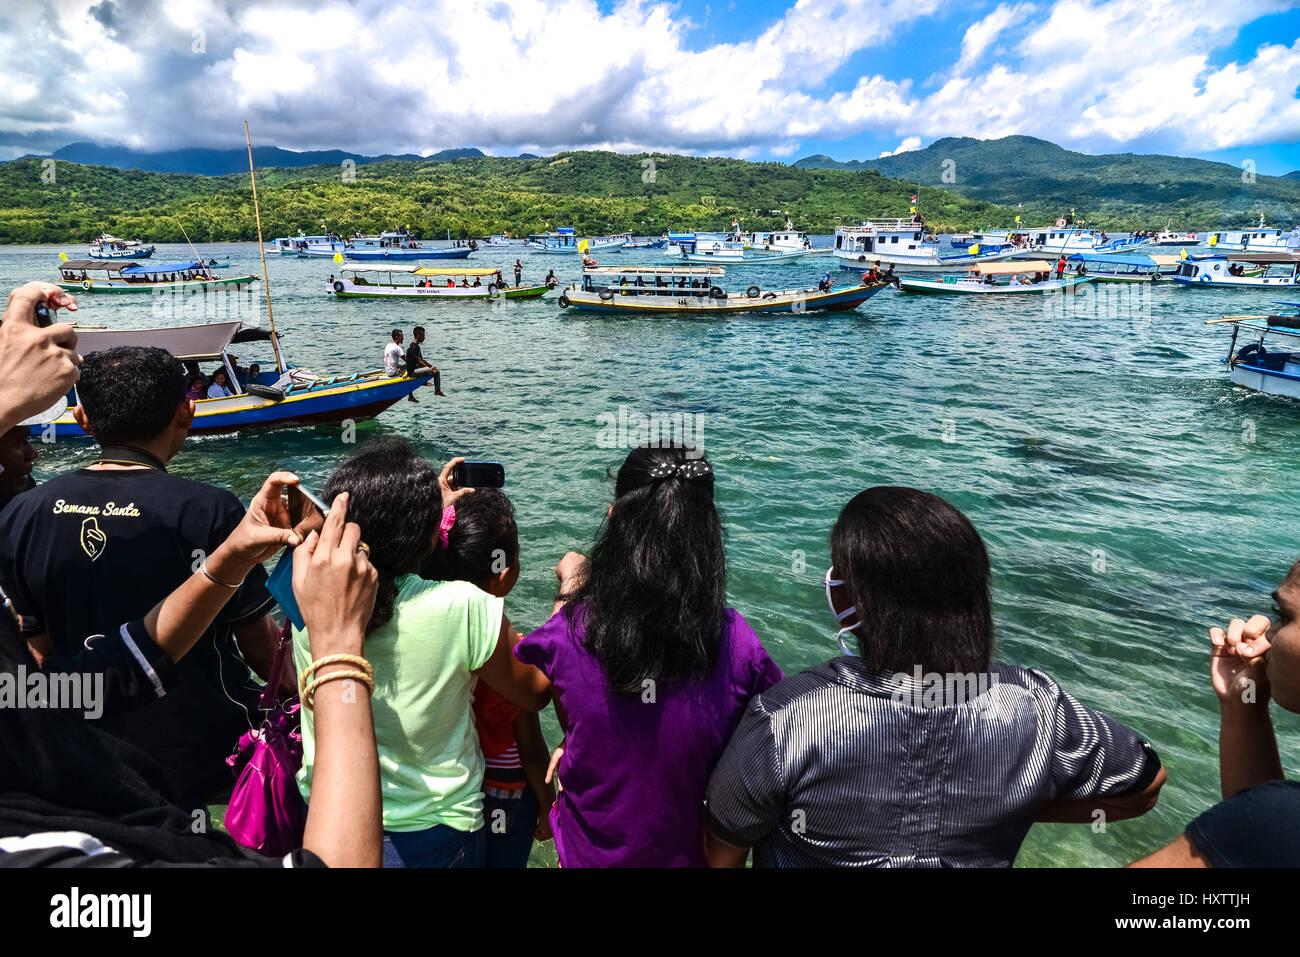 Foules regardant Semana Santa procession en mer Larantuka, Indonésie. Banque D'Images